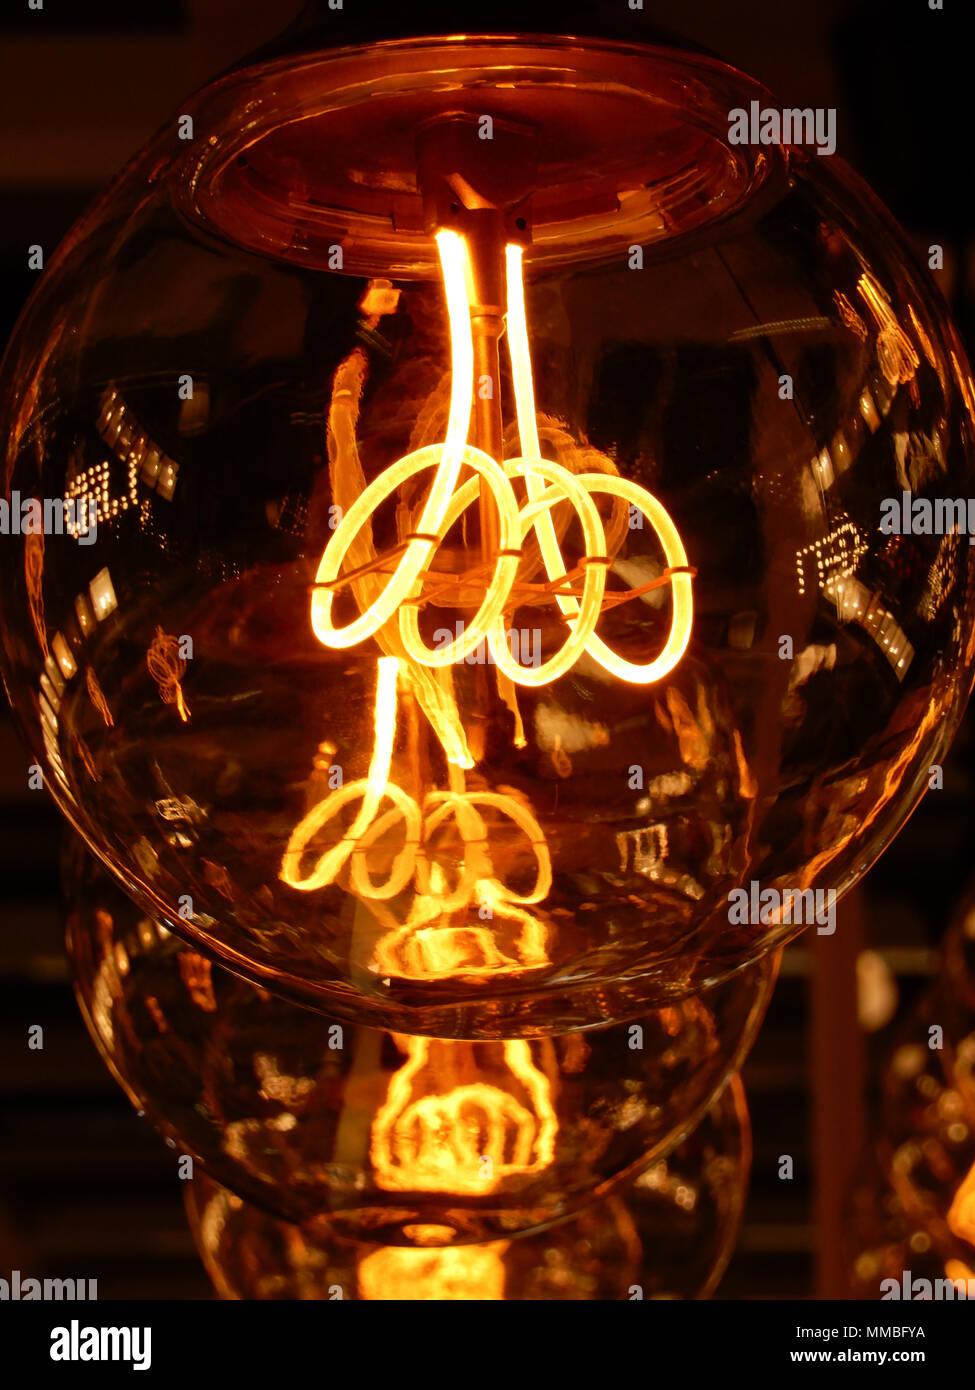 Glowing Filament Stockfotos & Glowing Filament Bilder - Alamy